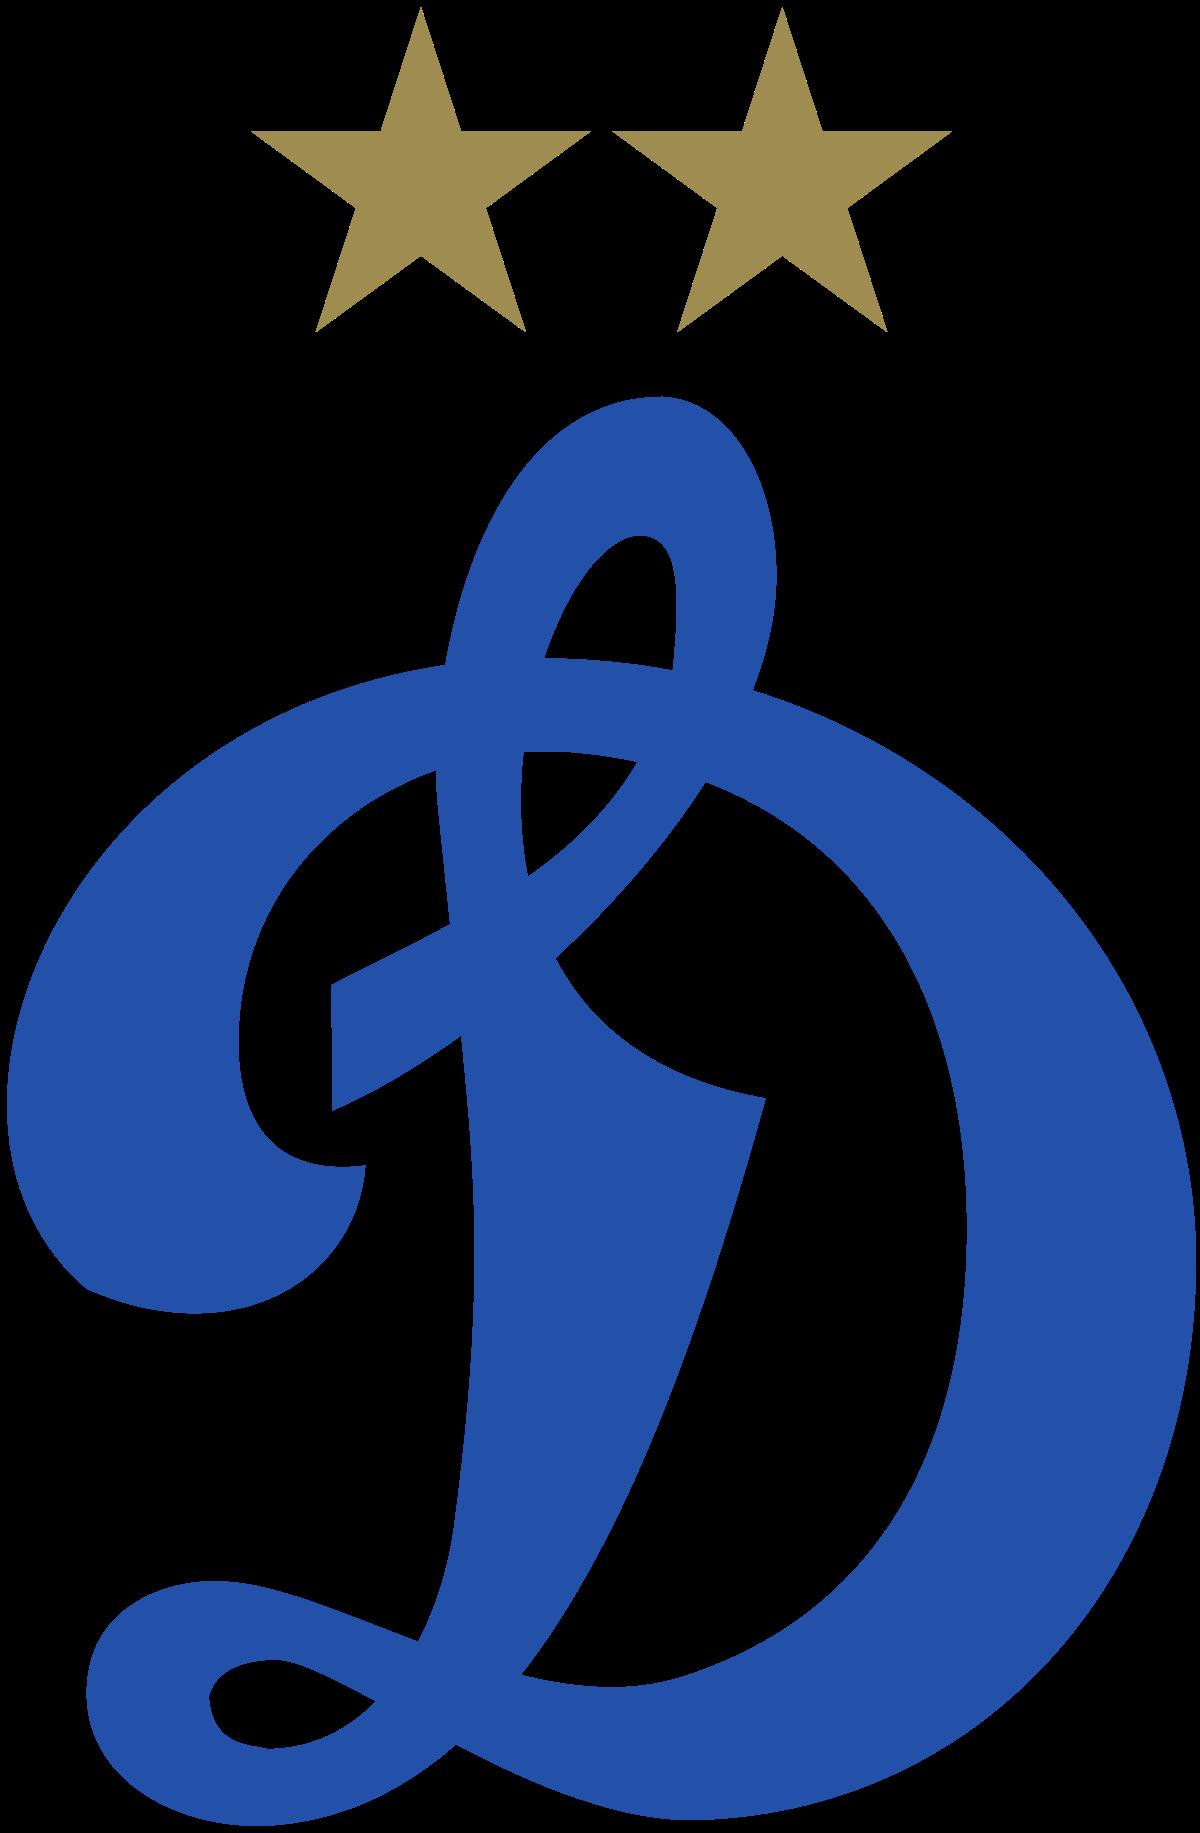 Dinamo M-2 logo